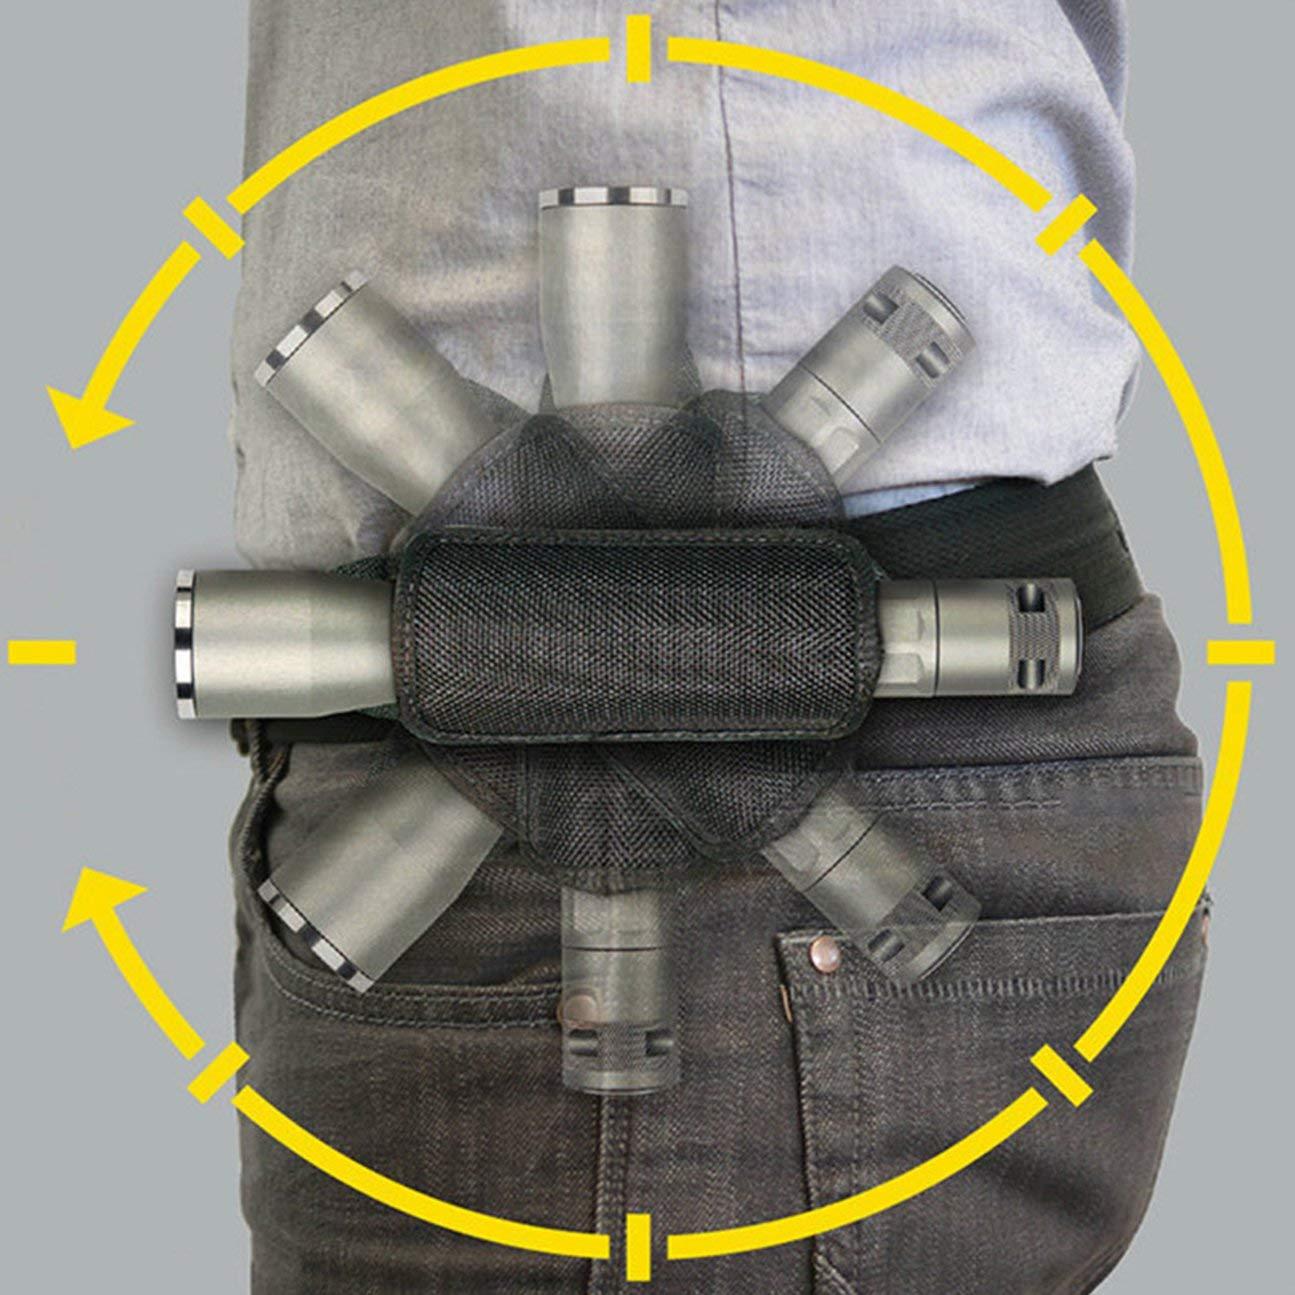 HIPENGYANBAIHU Cubierta Multifuncional de Linterna t/áctica giratoria de 360 Grados para Exteriores Bolsa t/áctica